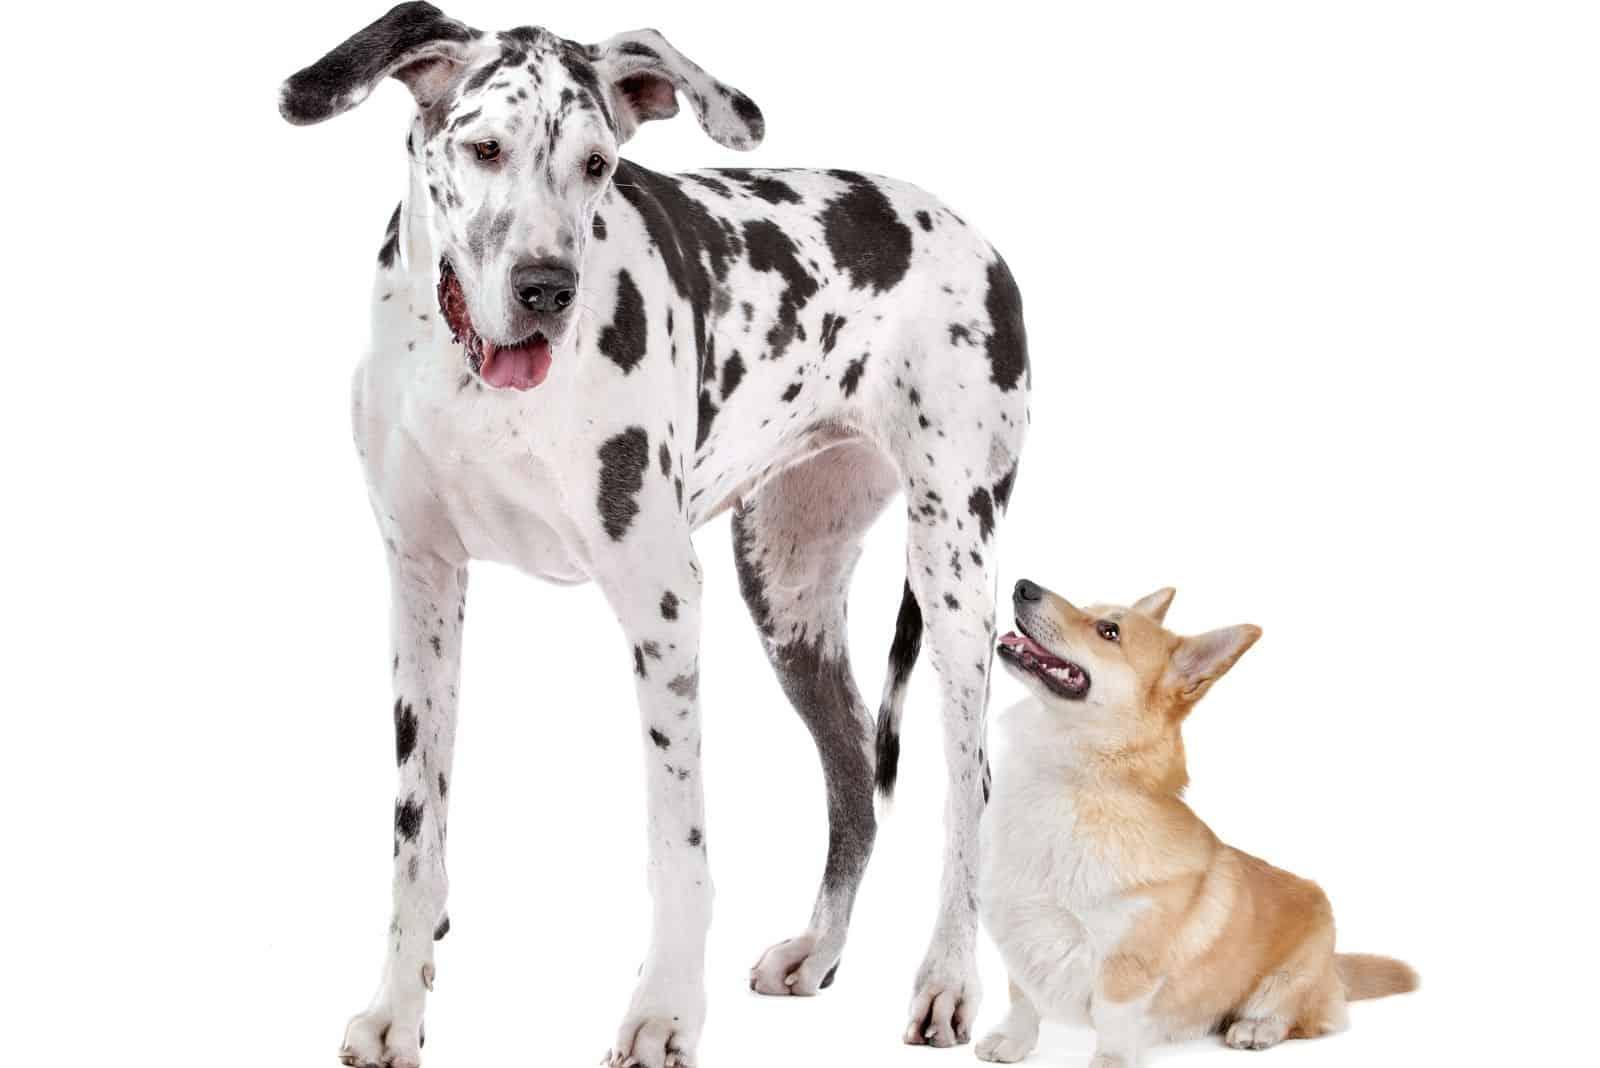 harlequin great dane and a pembroke welsh corgi dog in white background